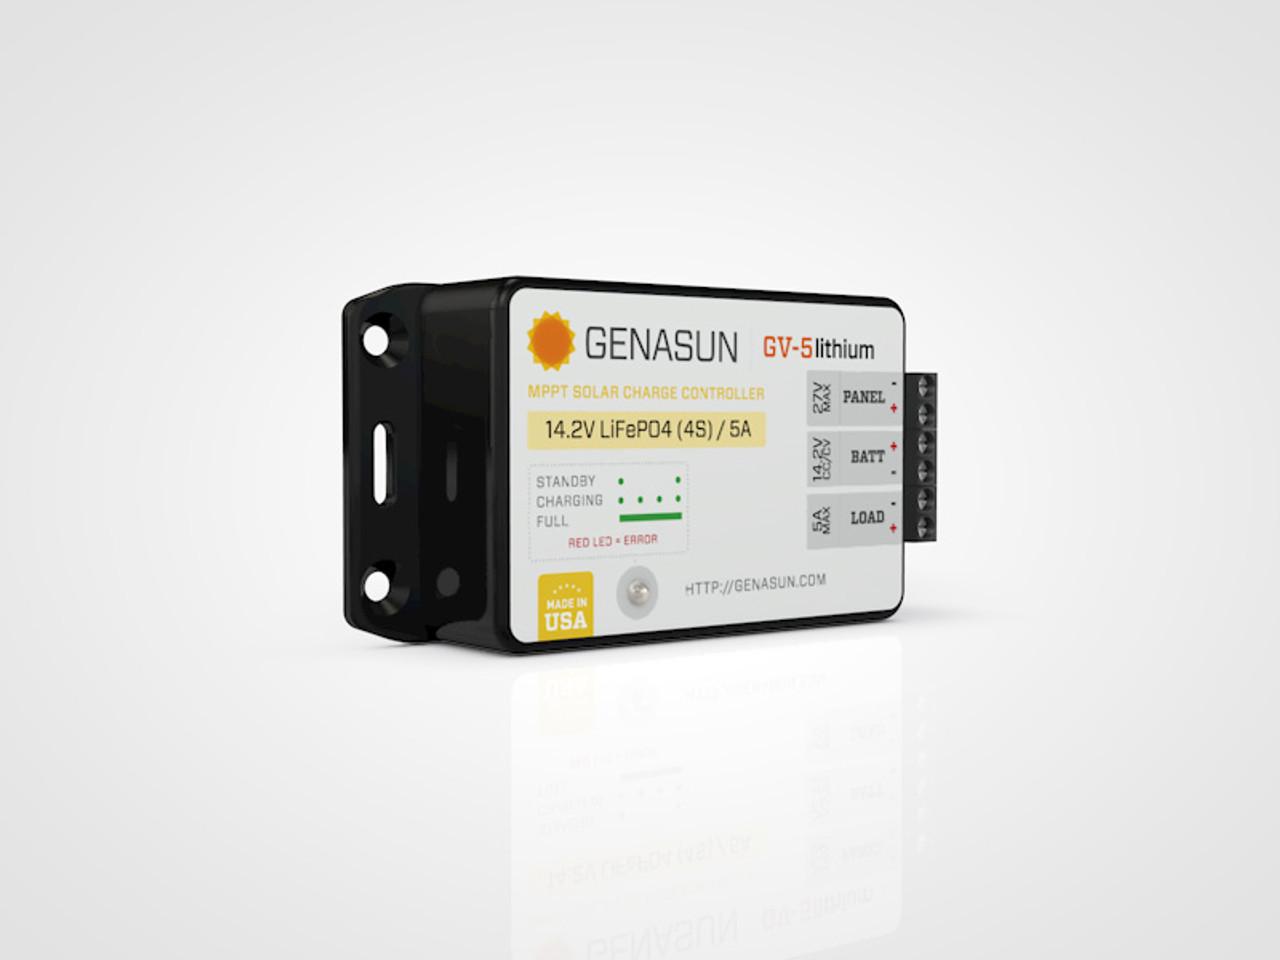 GV-5 | 65W 5A 14.2V Genasun MPPT Solar Charge Controller - Li - Left2